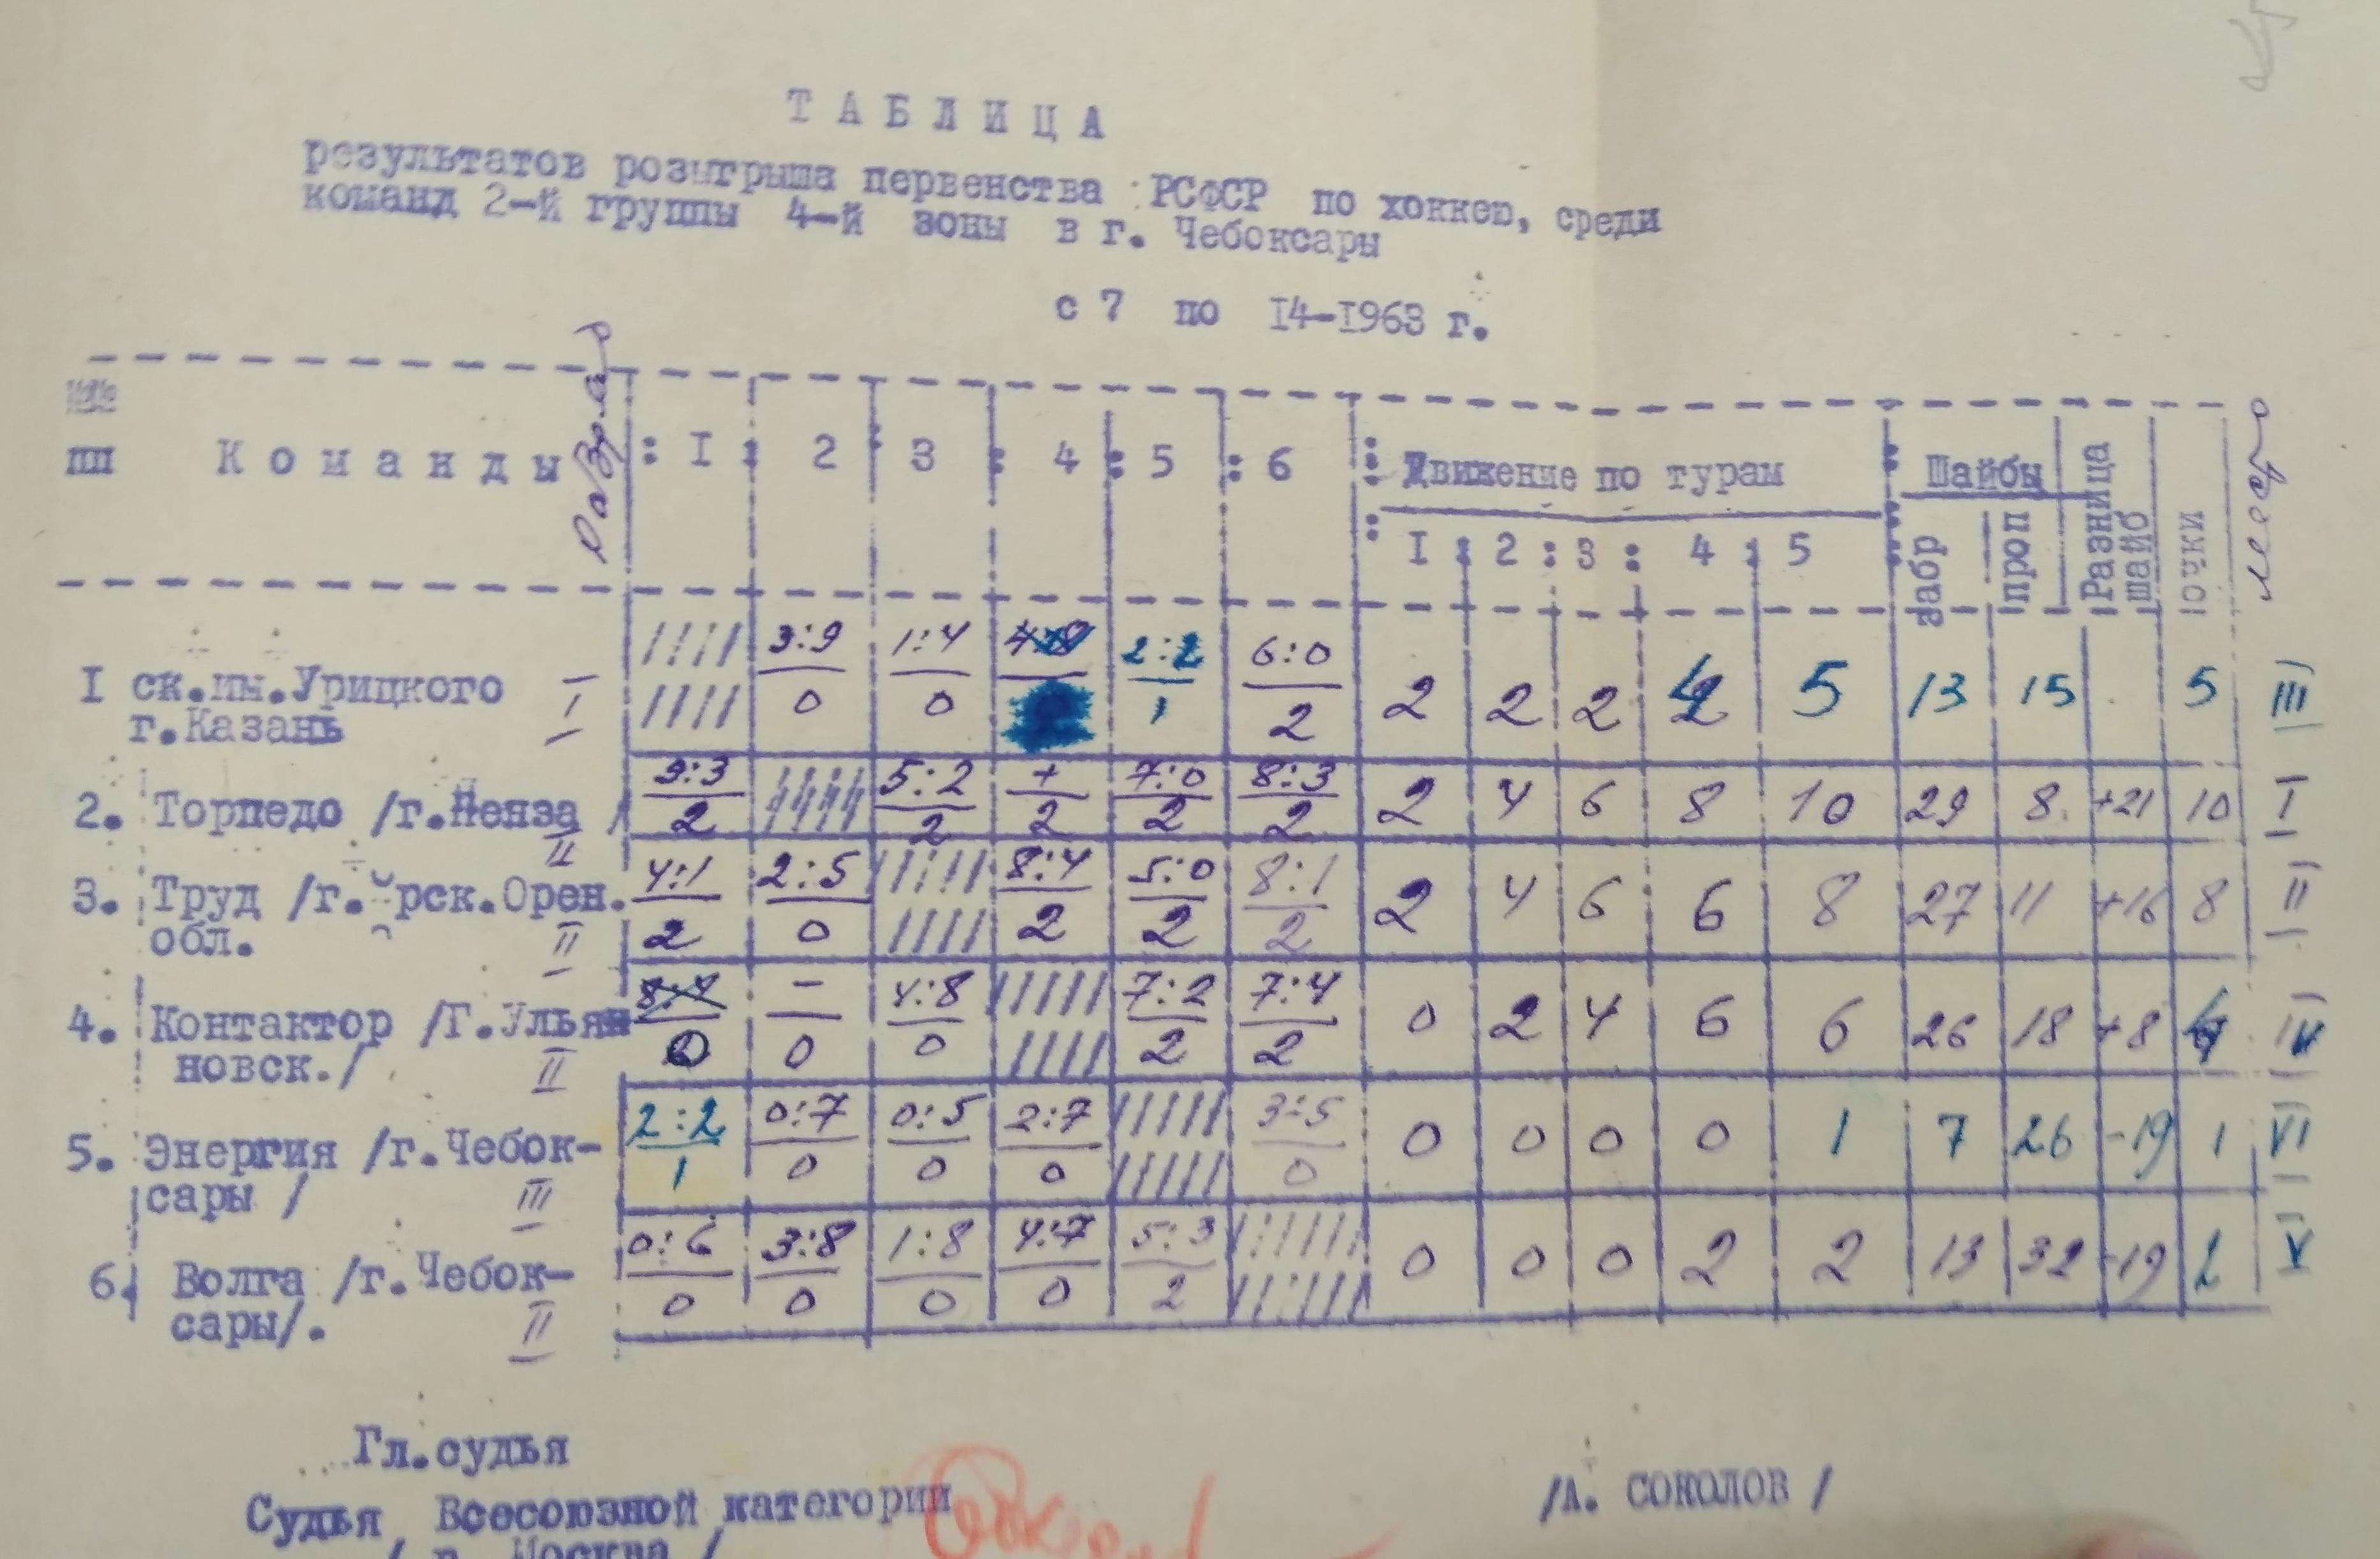 1962-63 РСФСР, 2 группа, 4 зона.jpg